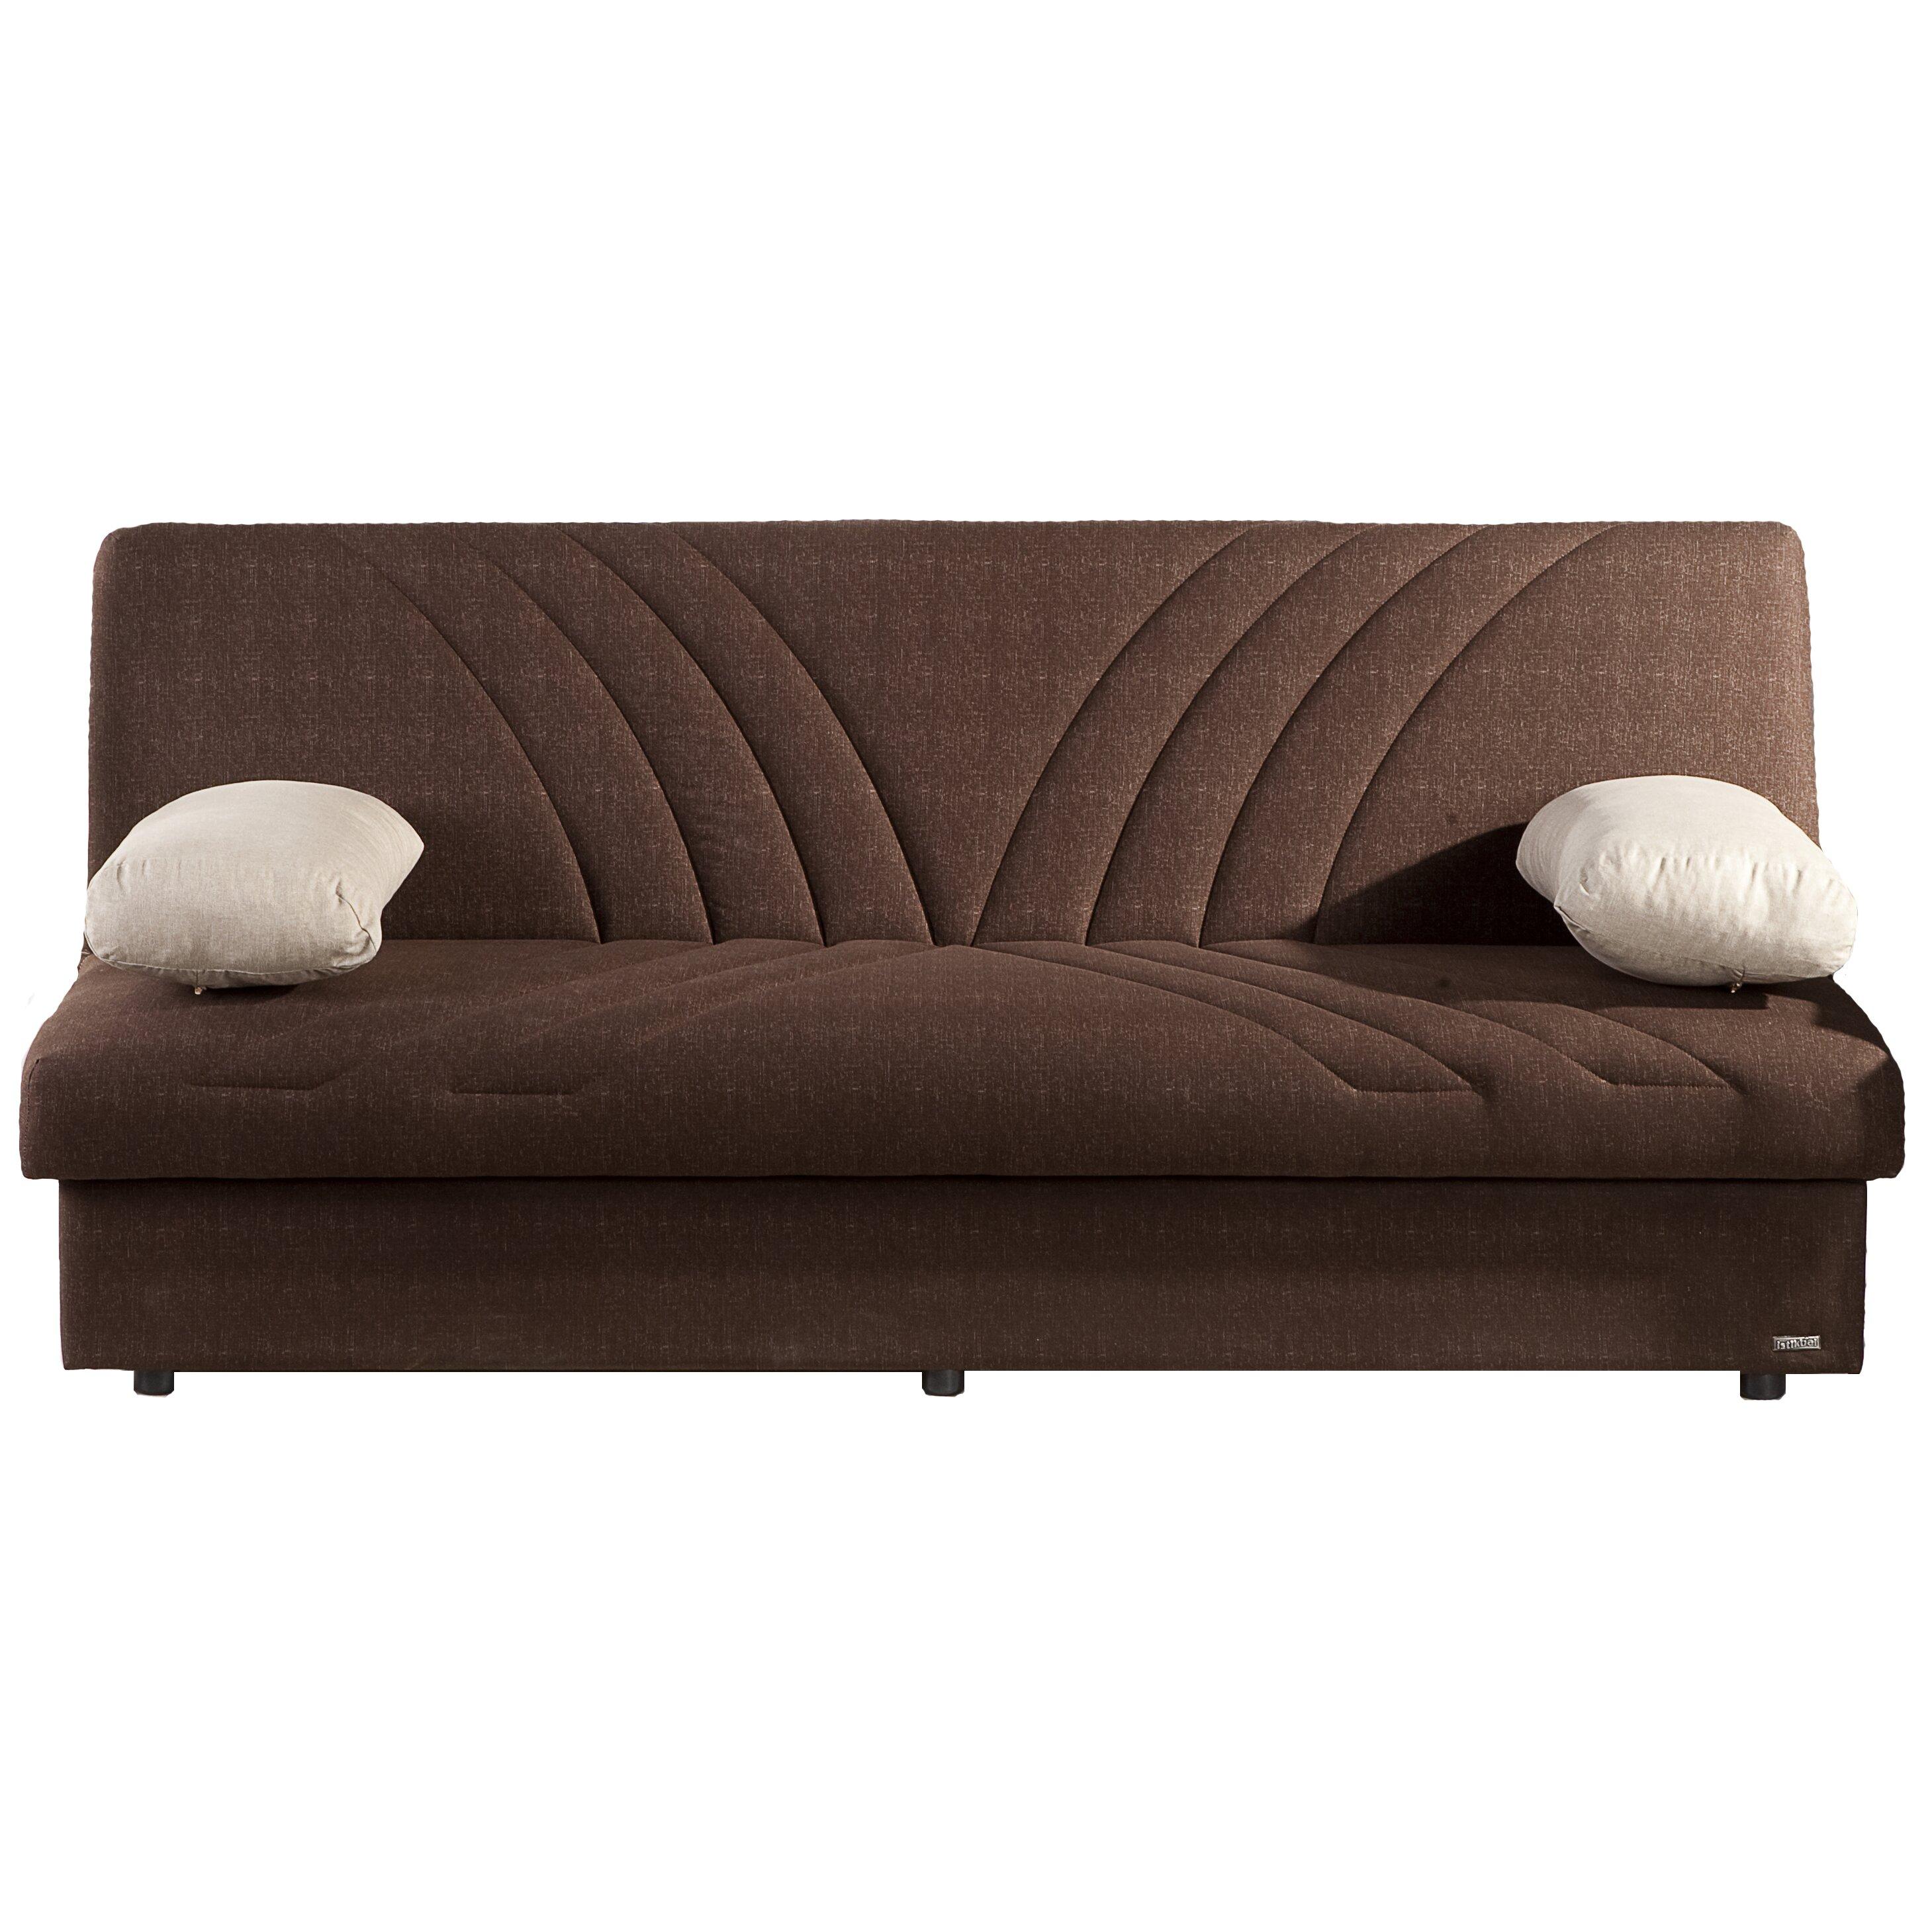 brayden studio justice three seat sleeper sofa reviews